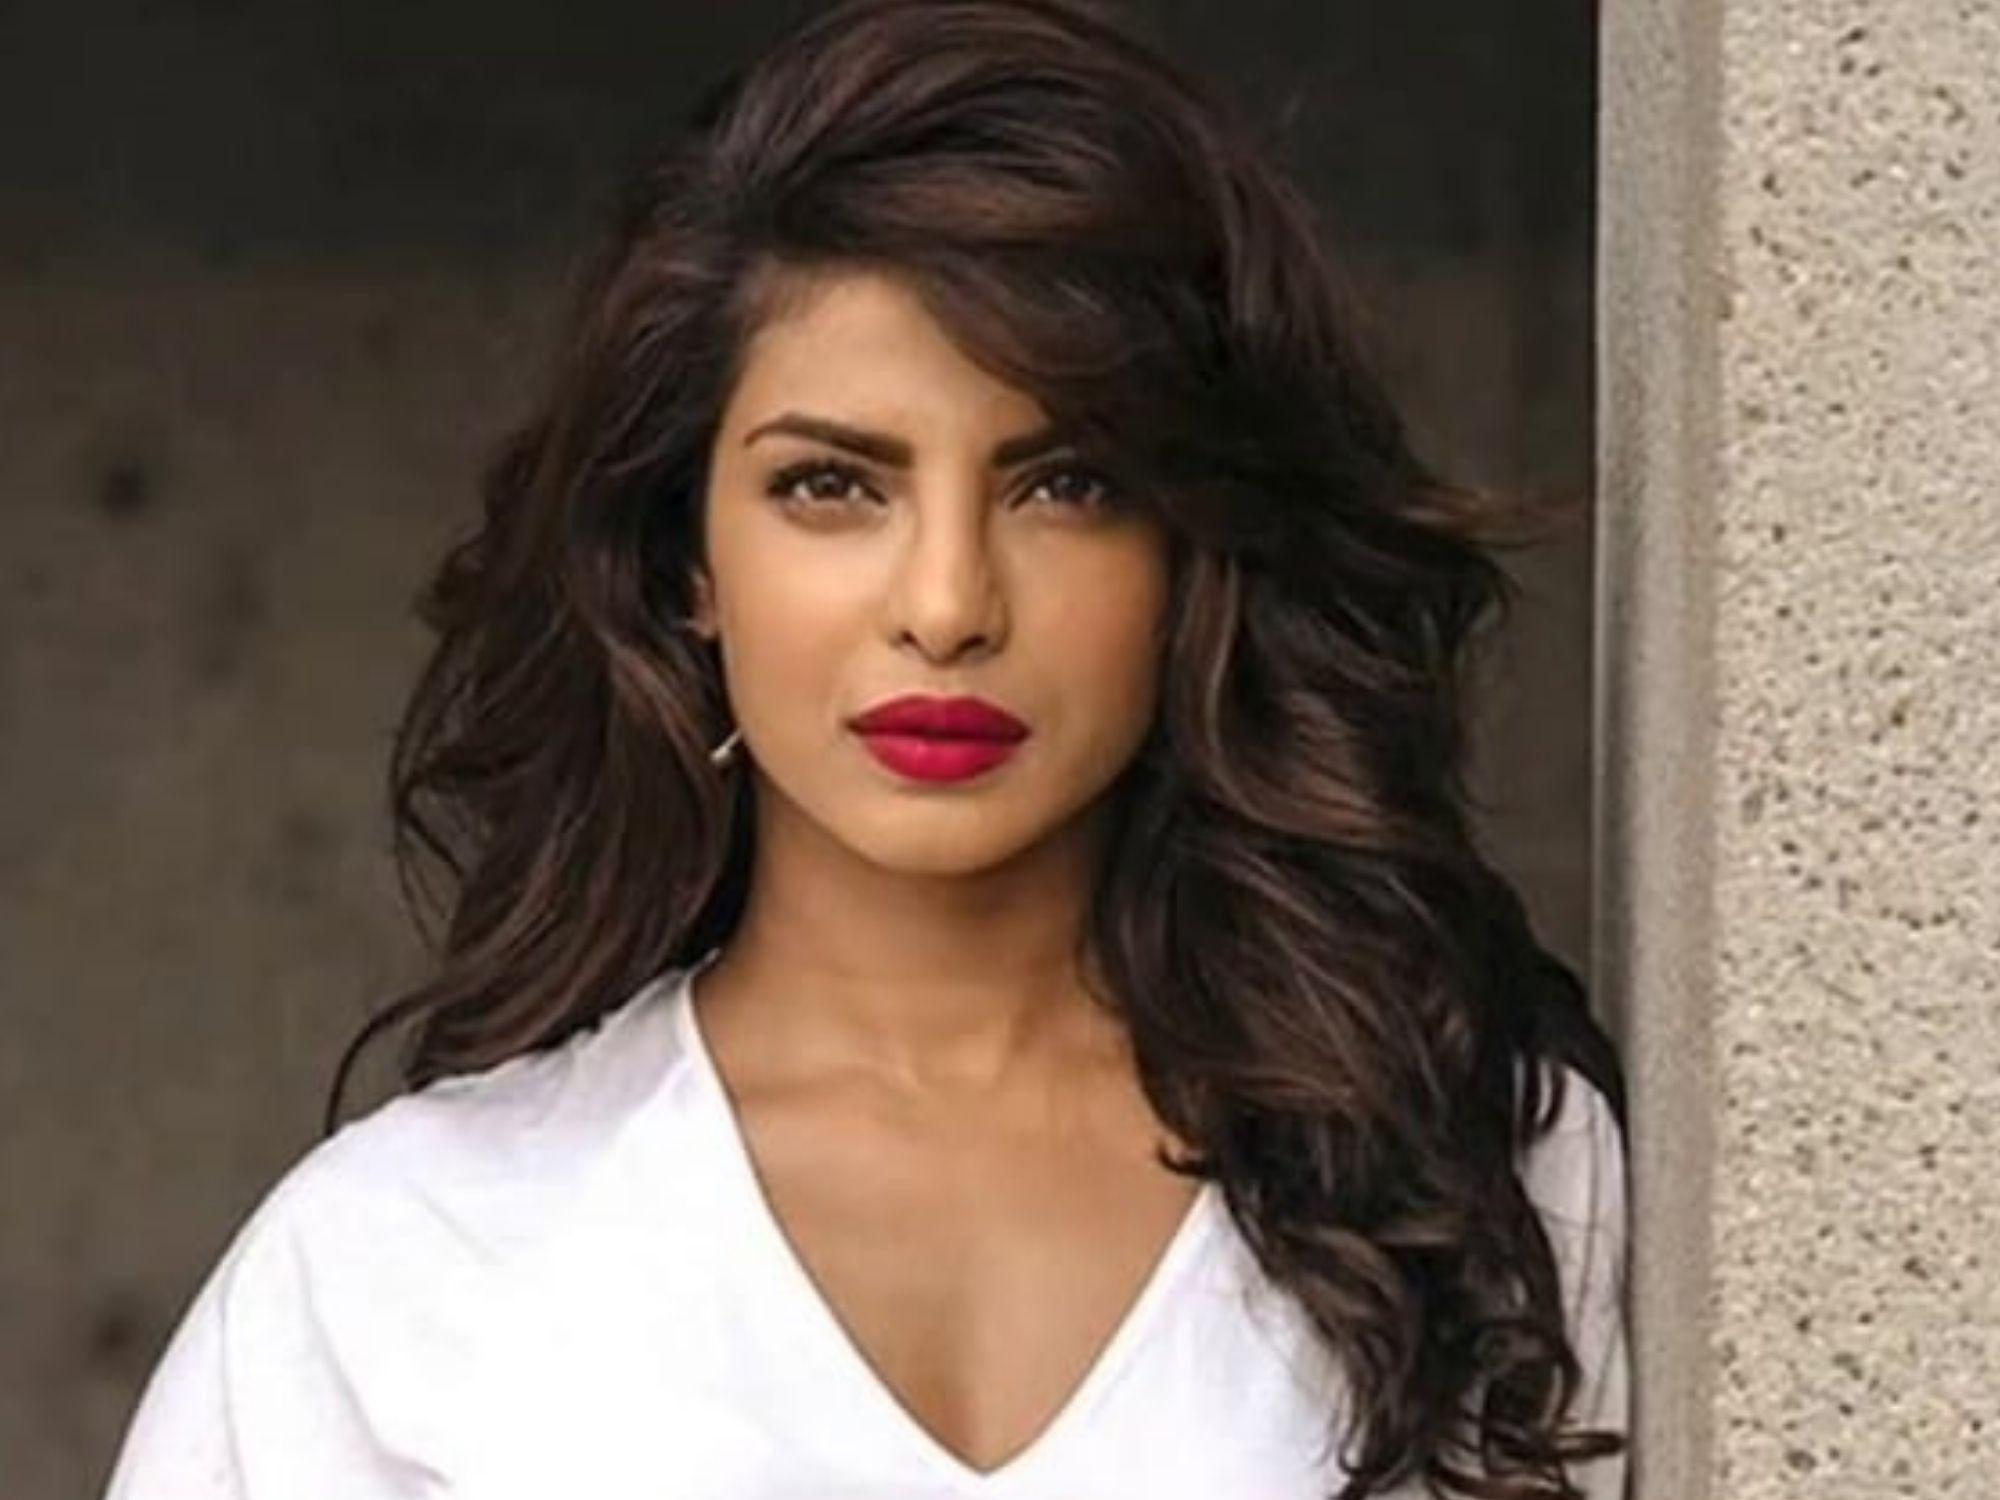 Priyanka Chopra Jonas denies breaking United Kingdom lockdown rules